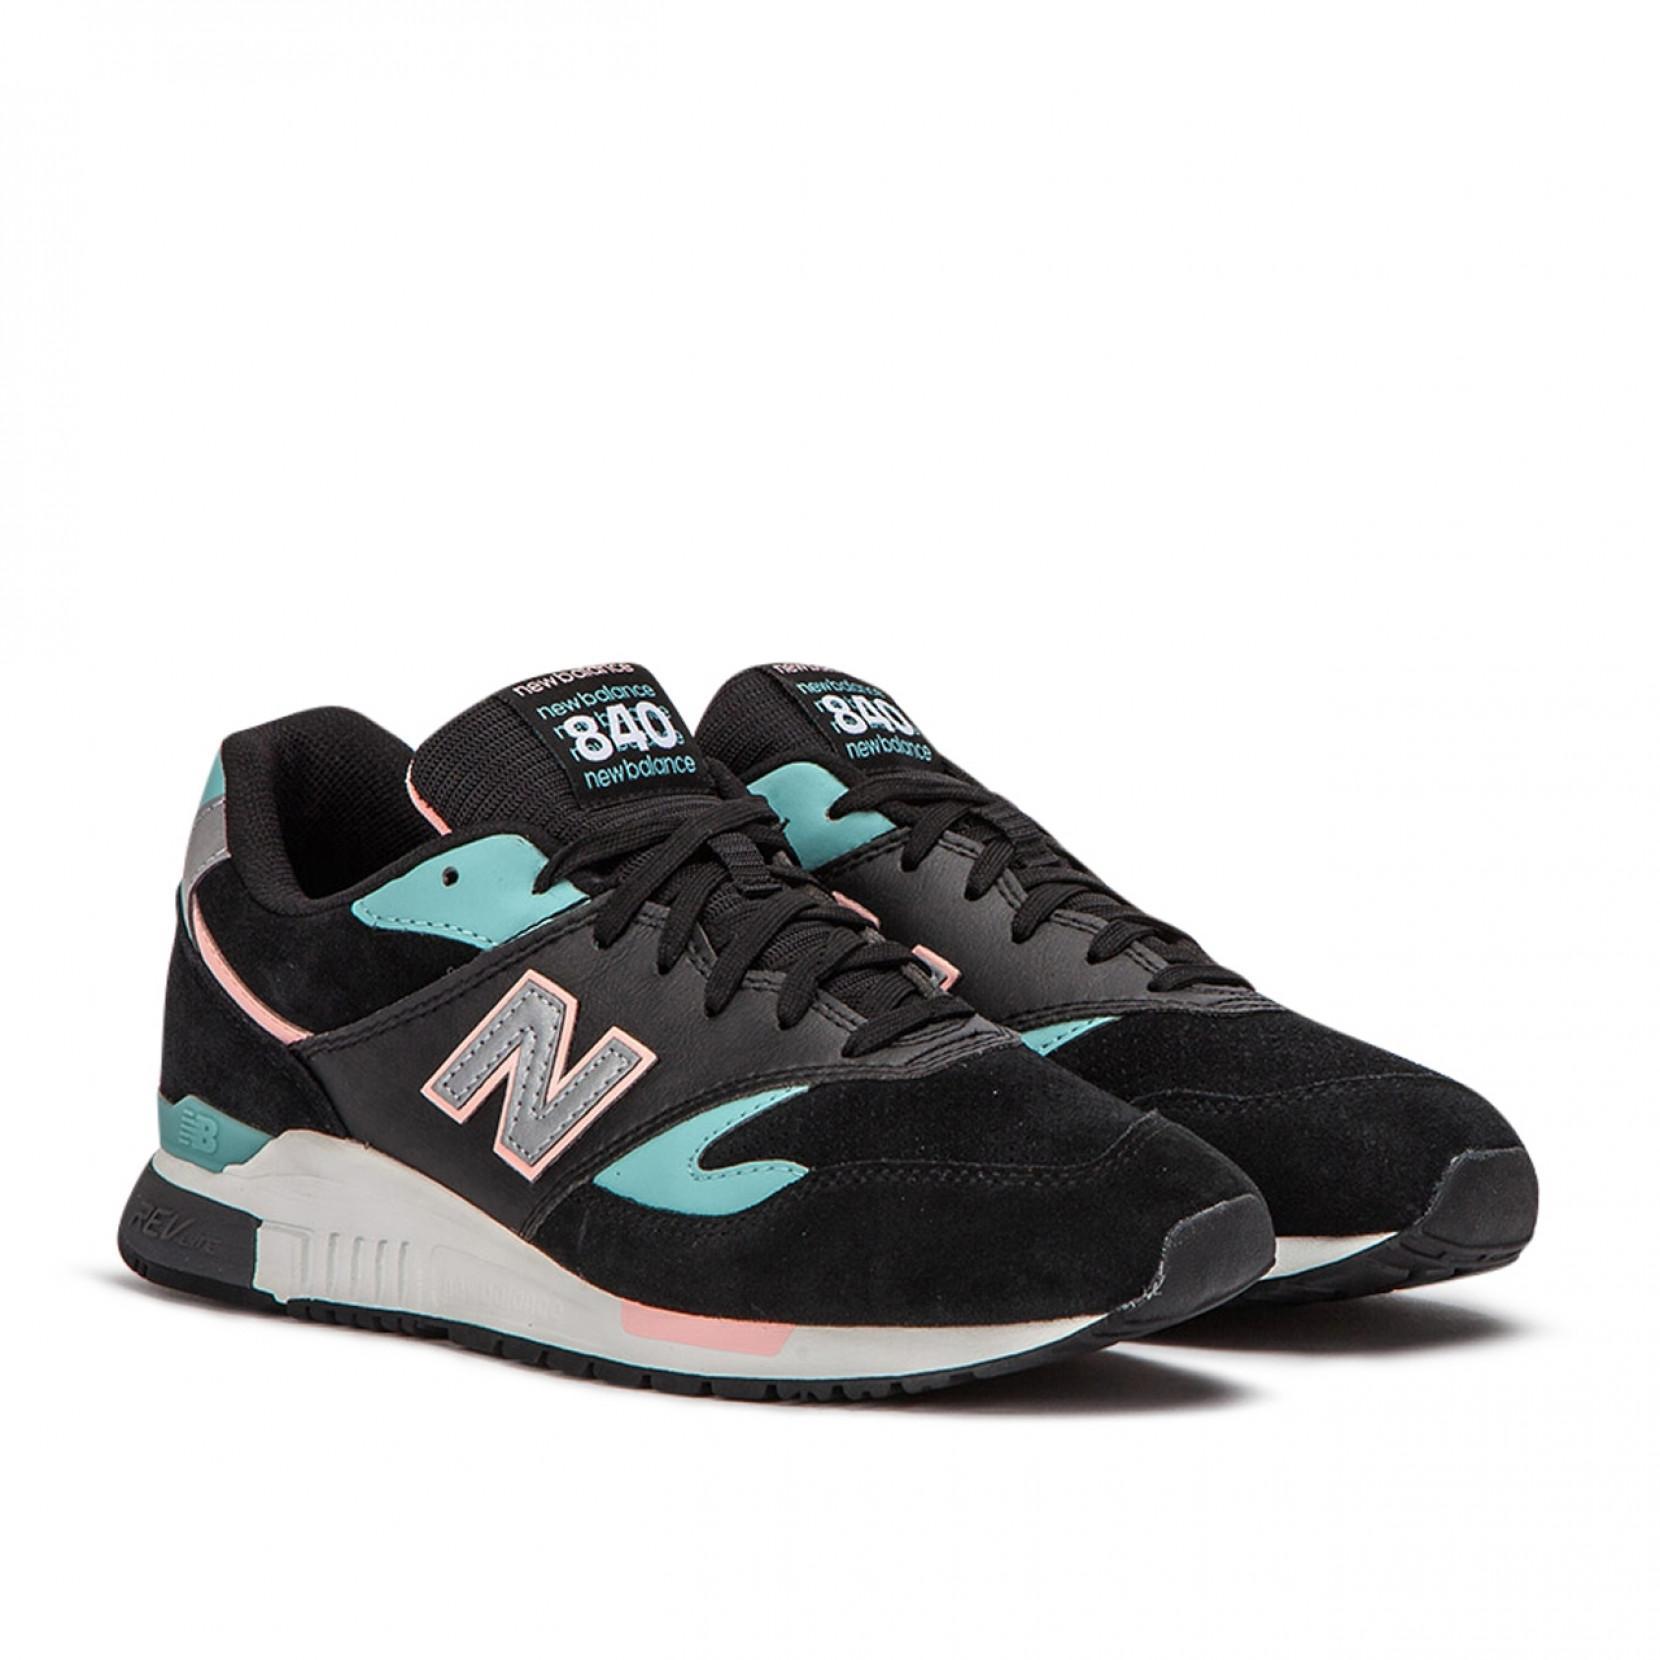 New Balance Ml840 Nta in Black for Men - Lyst